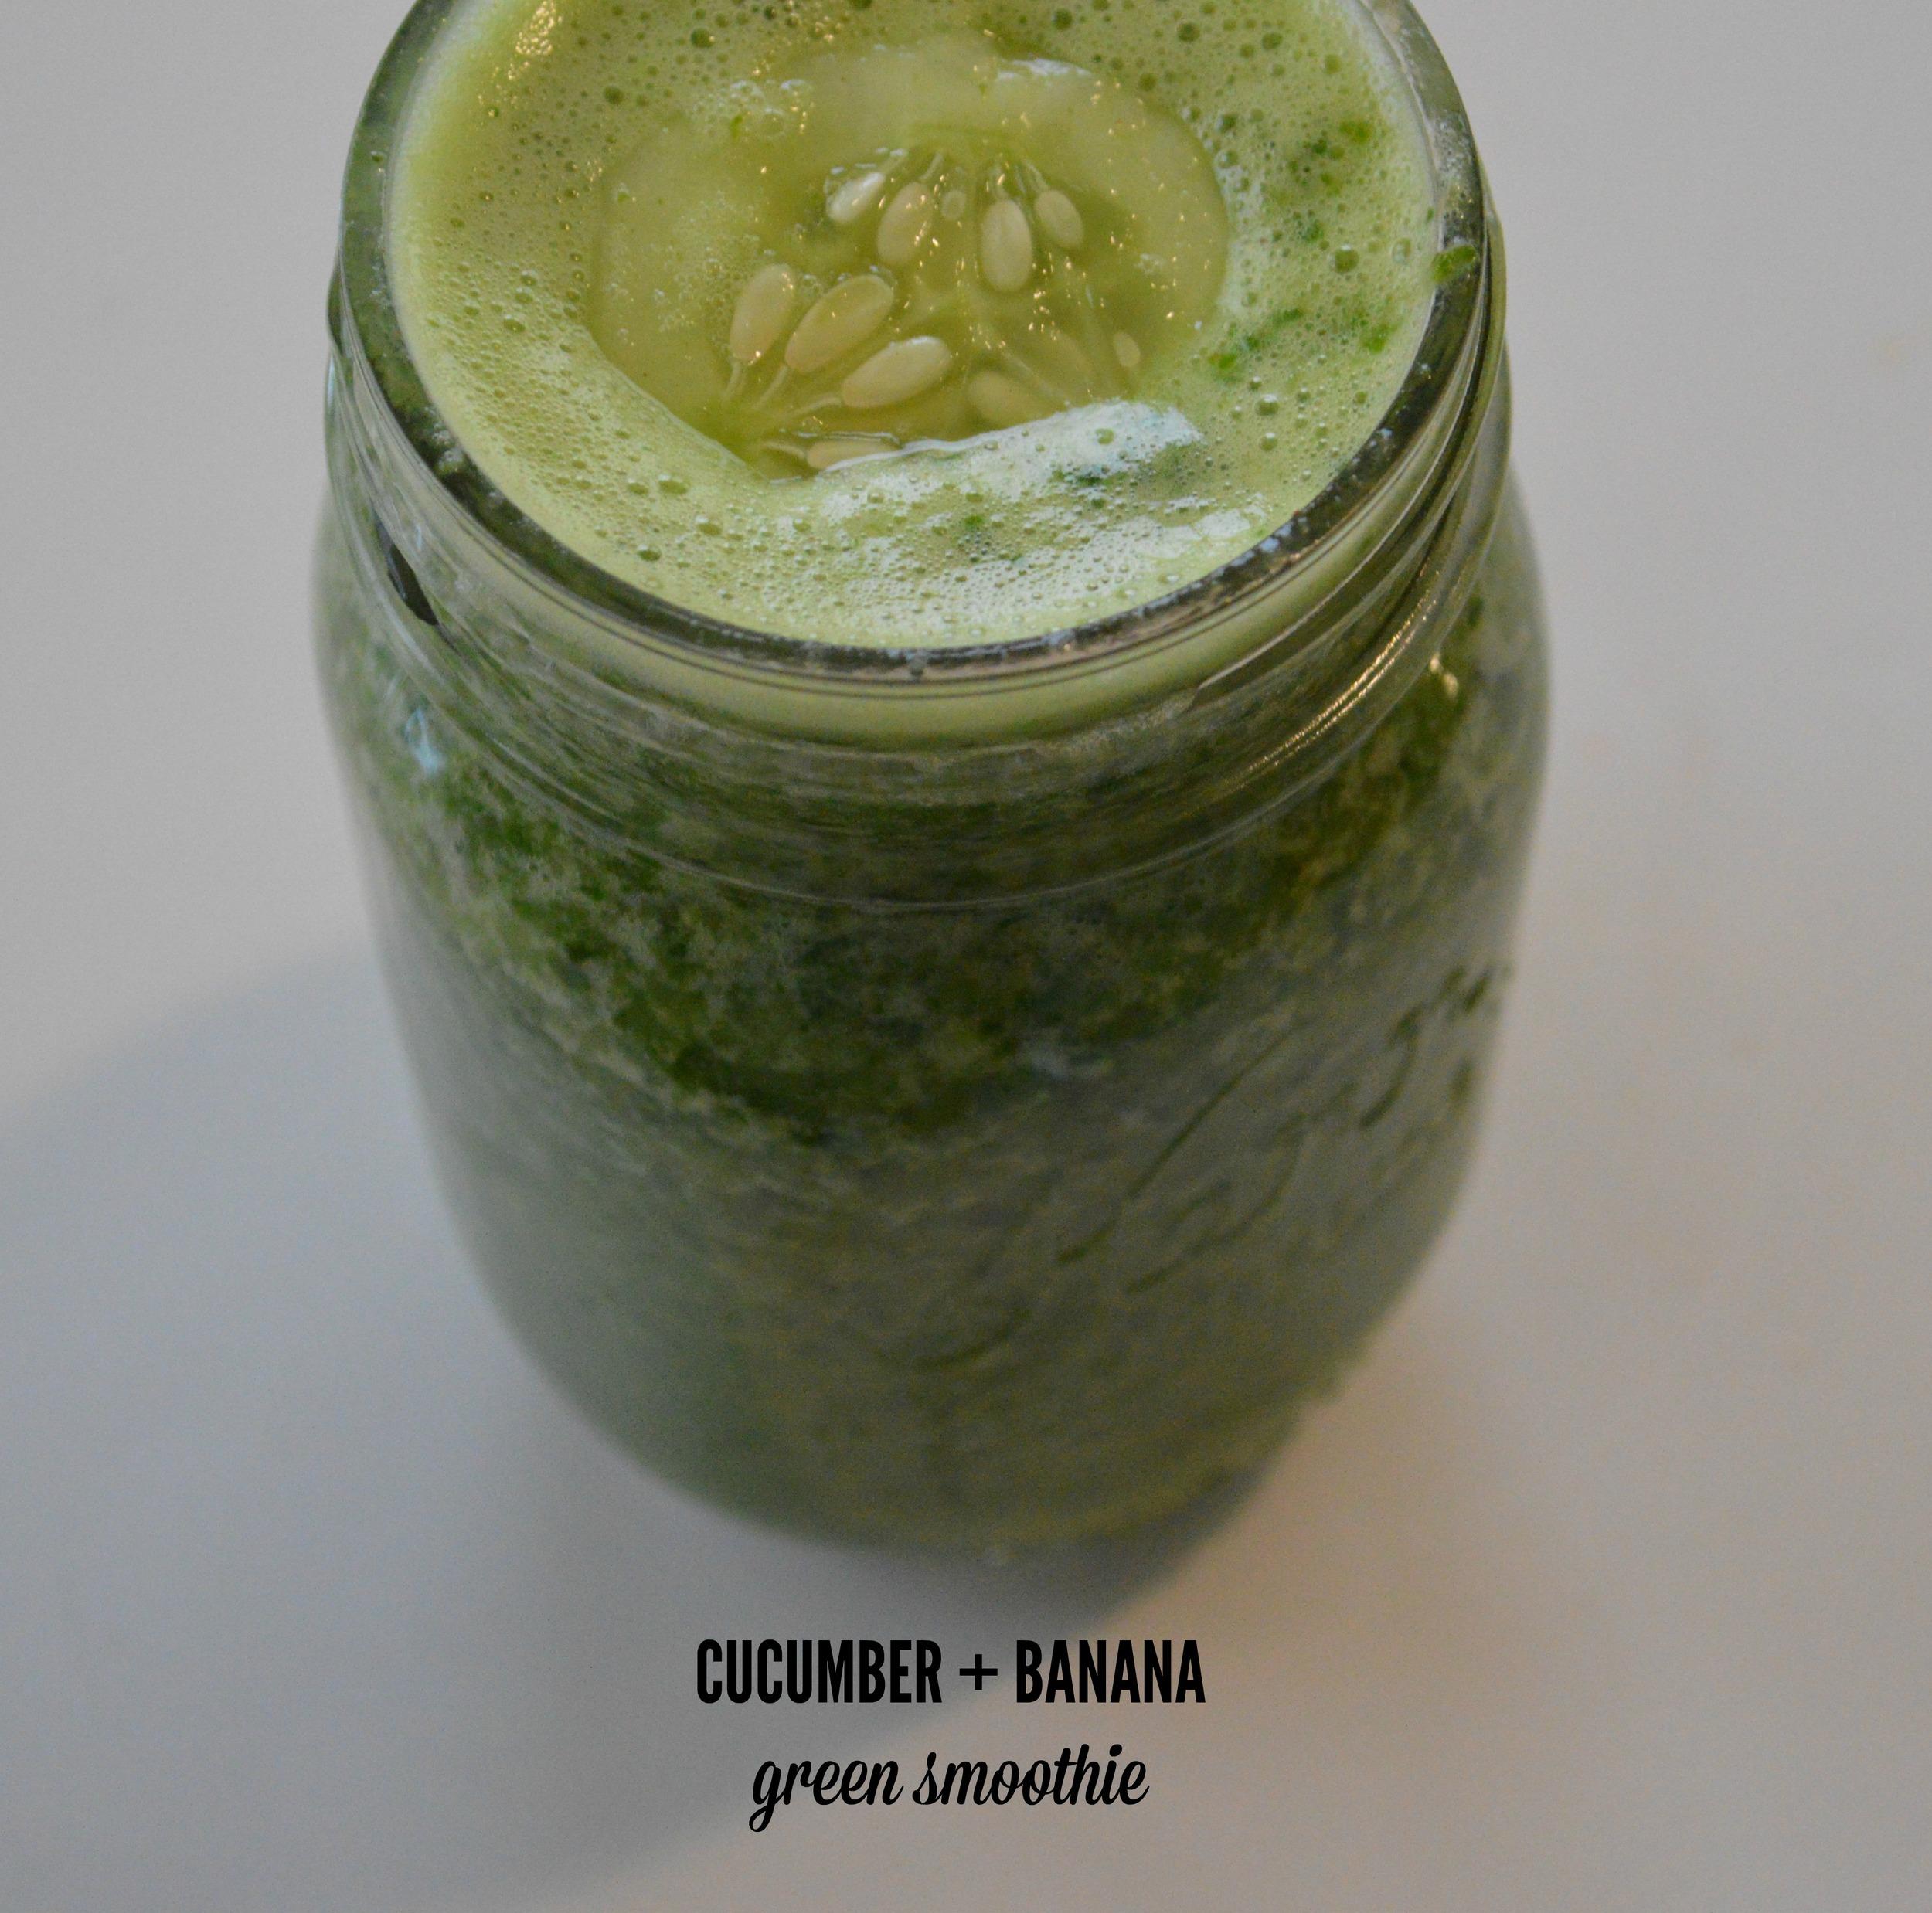 Cucumber + Banana Green Smoothie